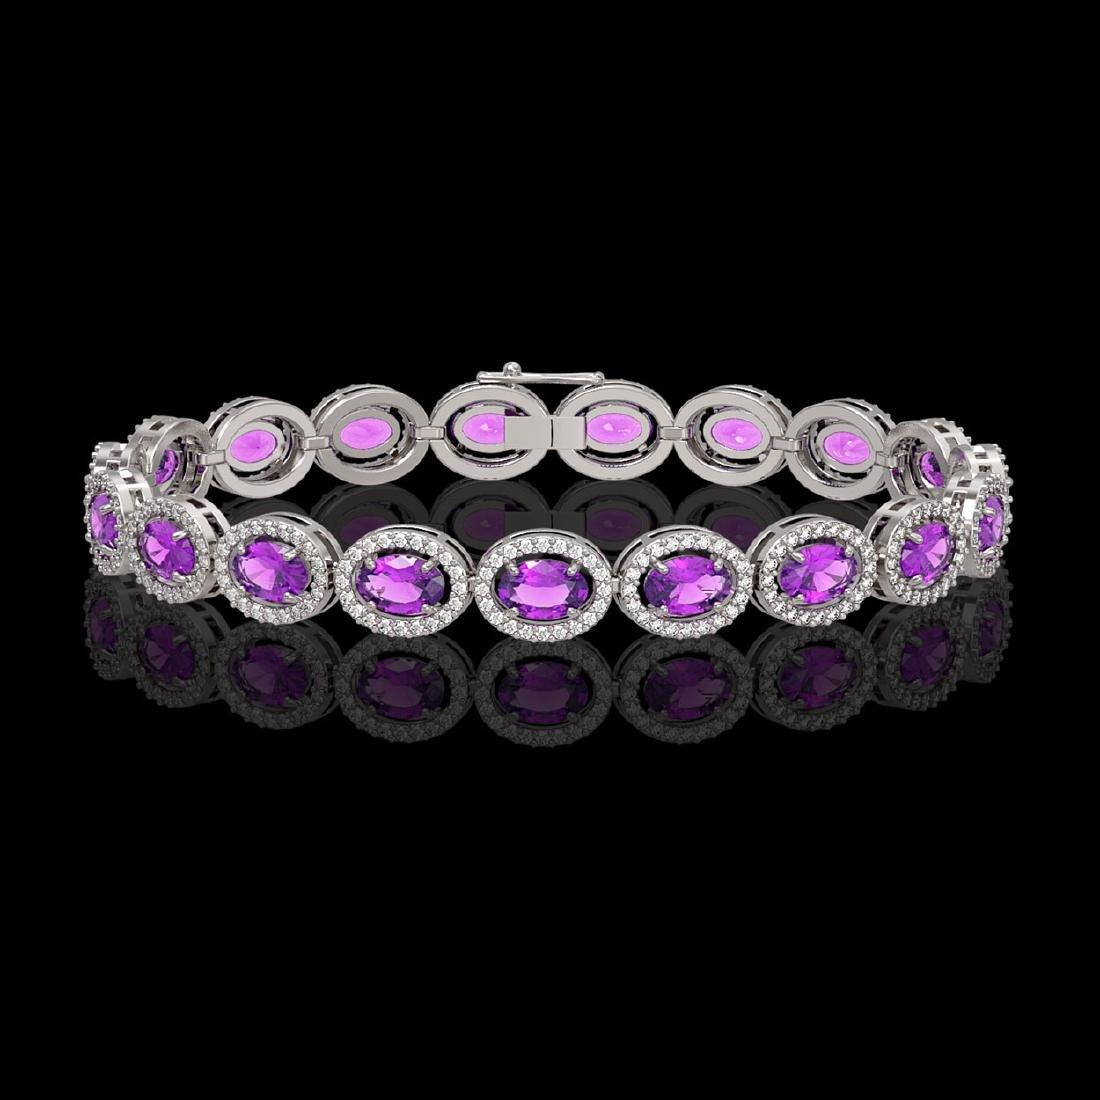 13.11 CTW Amethyst & Diamond Halo Bracelet 10K White